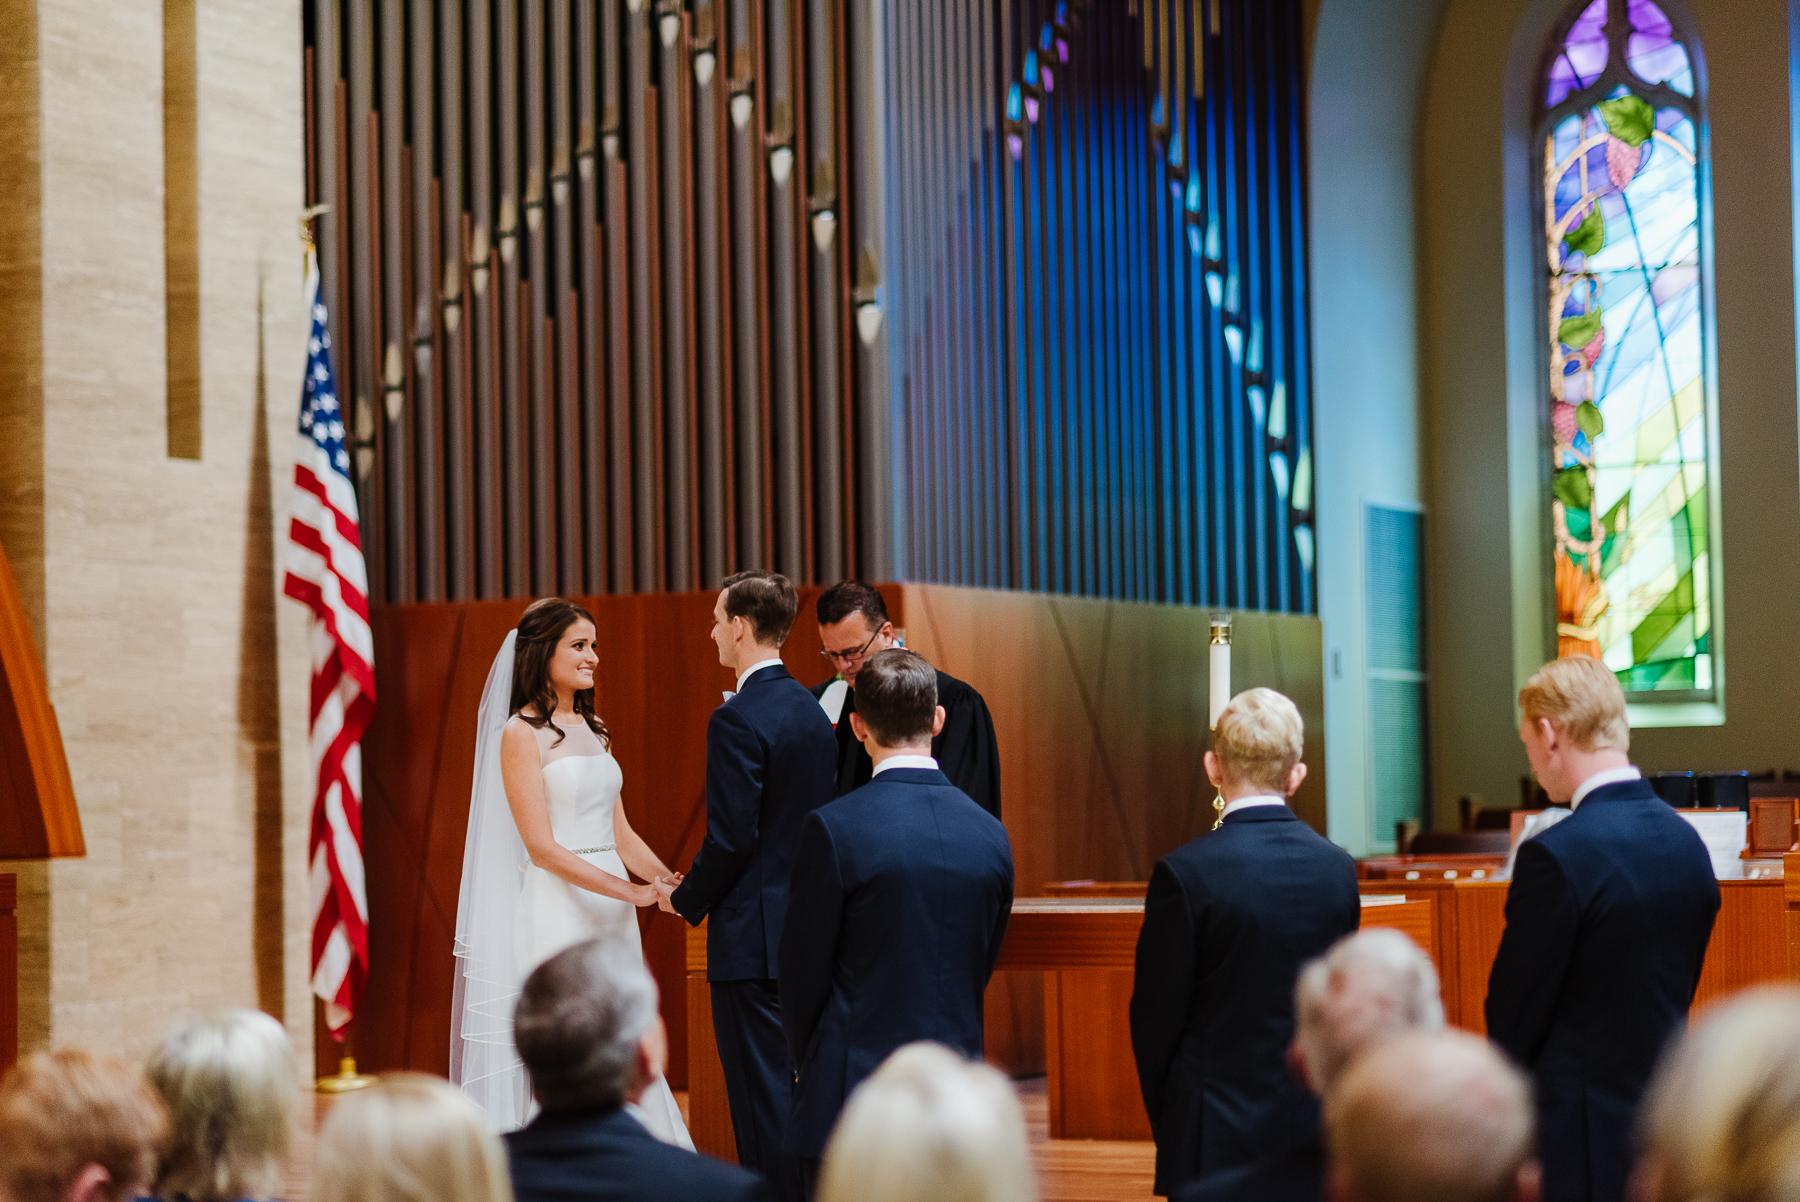 48-J Crew Wedding New Jersey Wedding Photographer J Crew Weddings.jpg